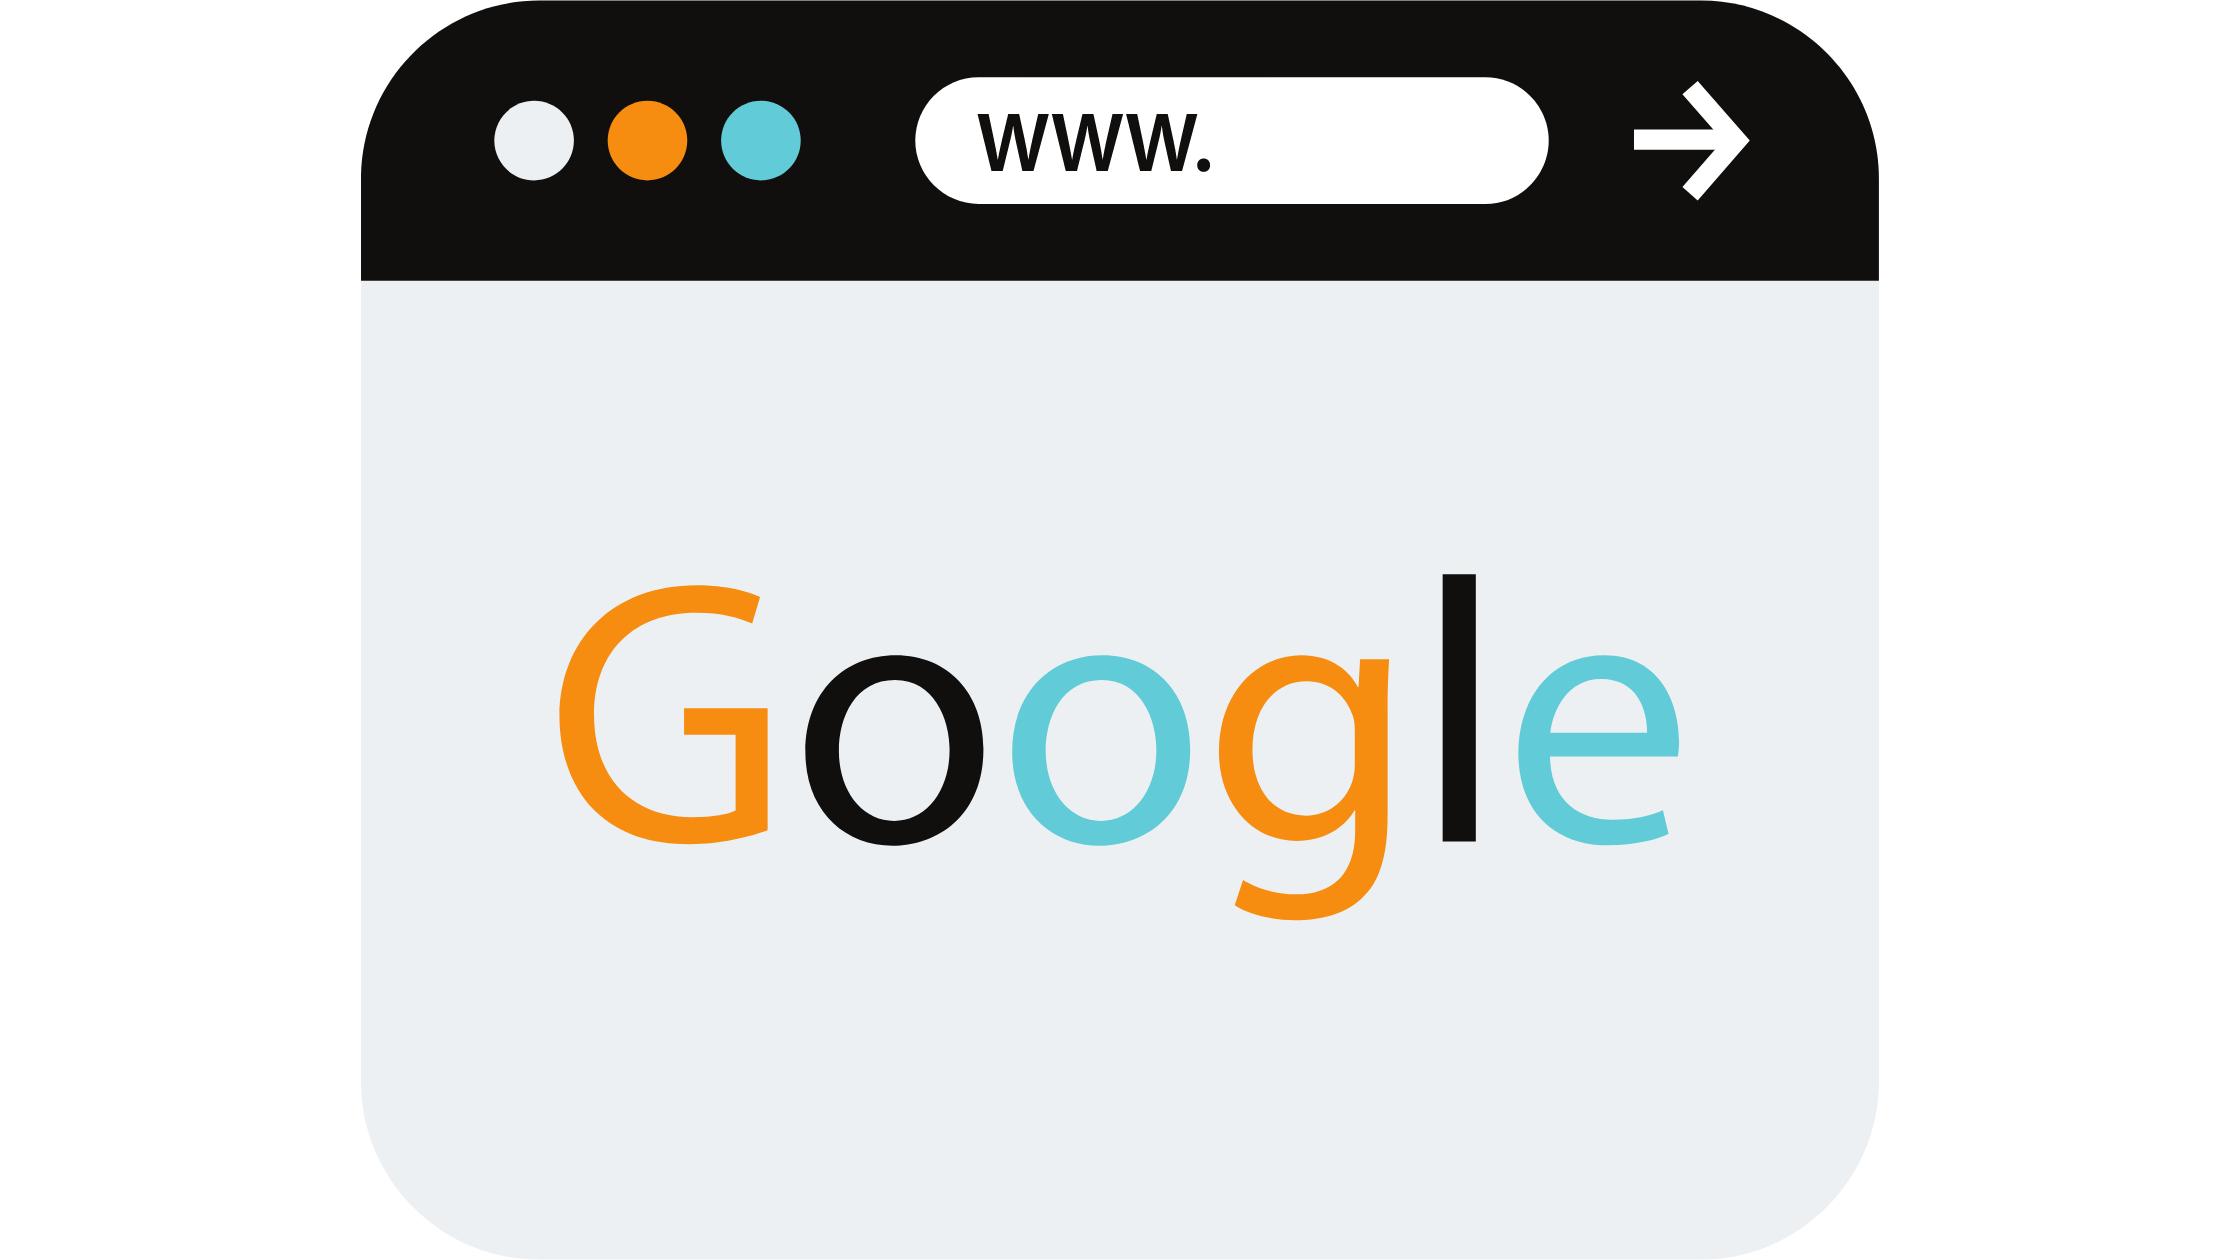 Google広告でシミュレーションを作成する重要性